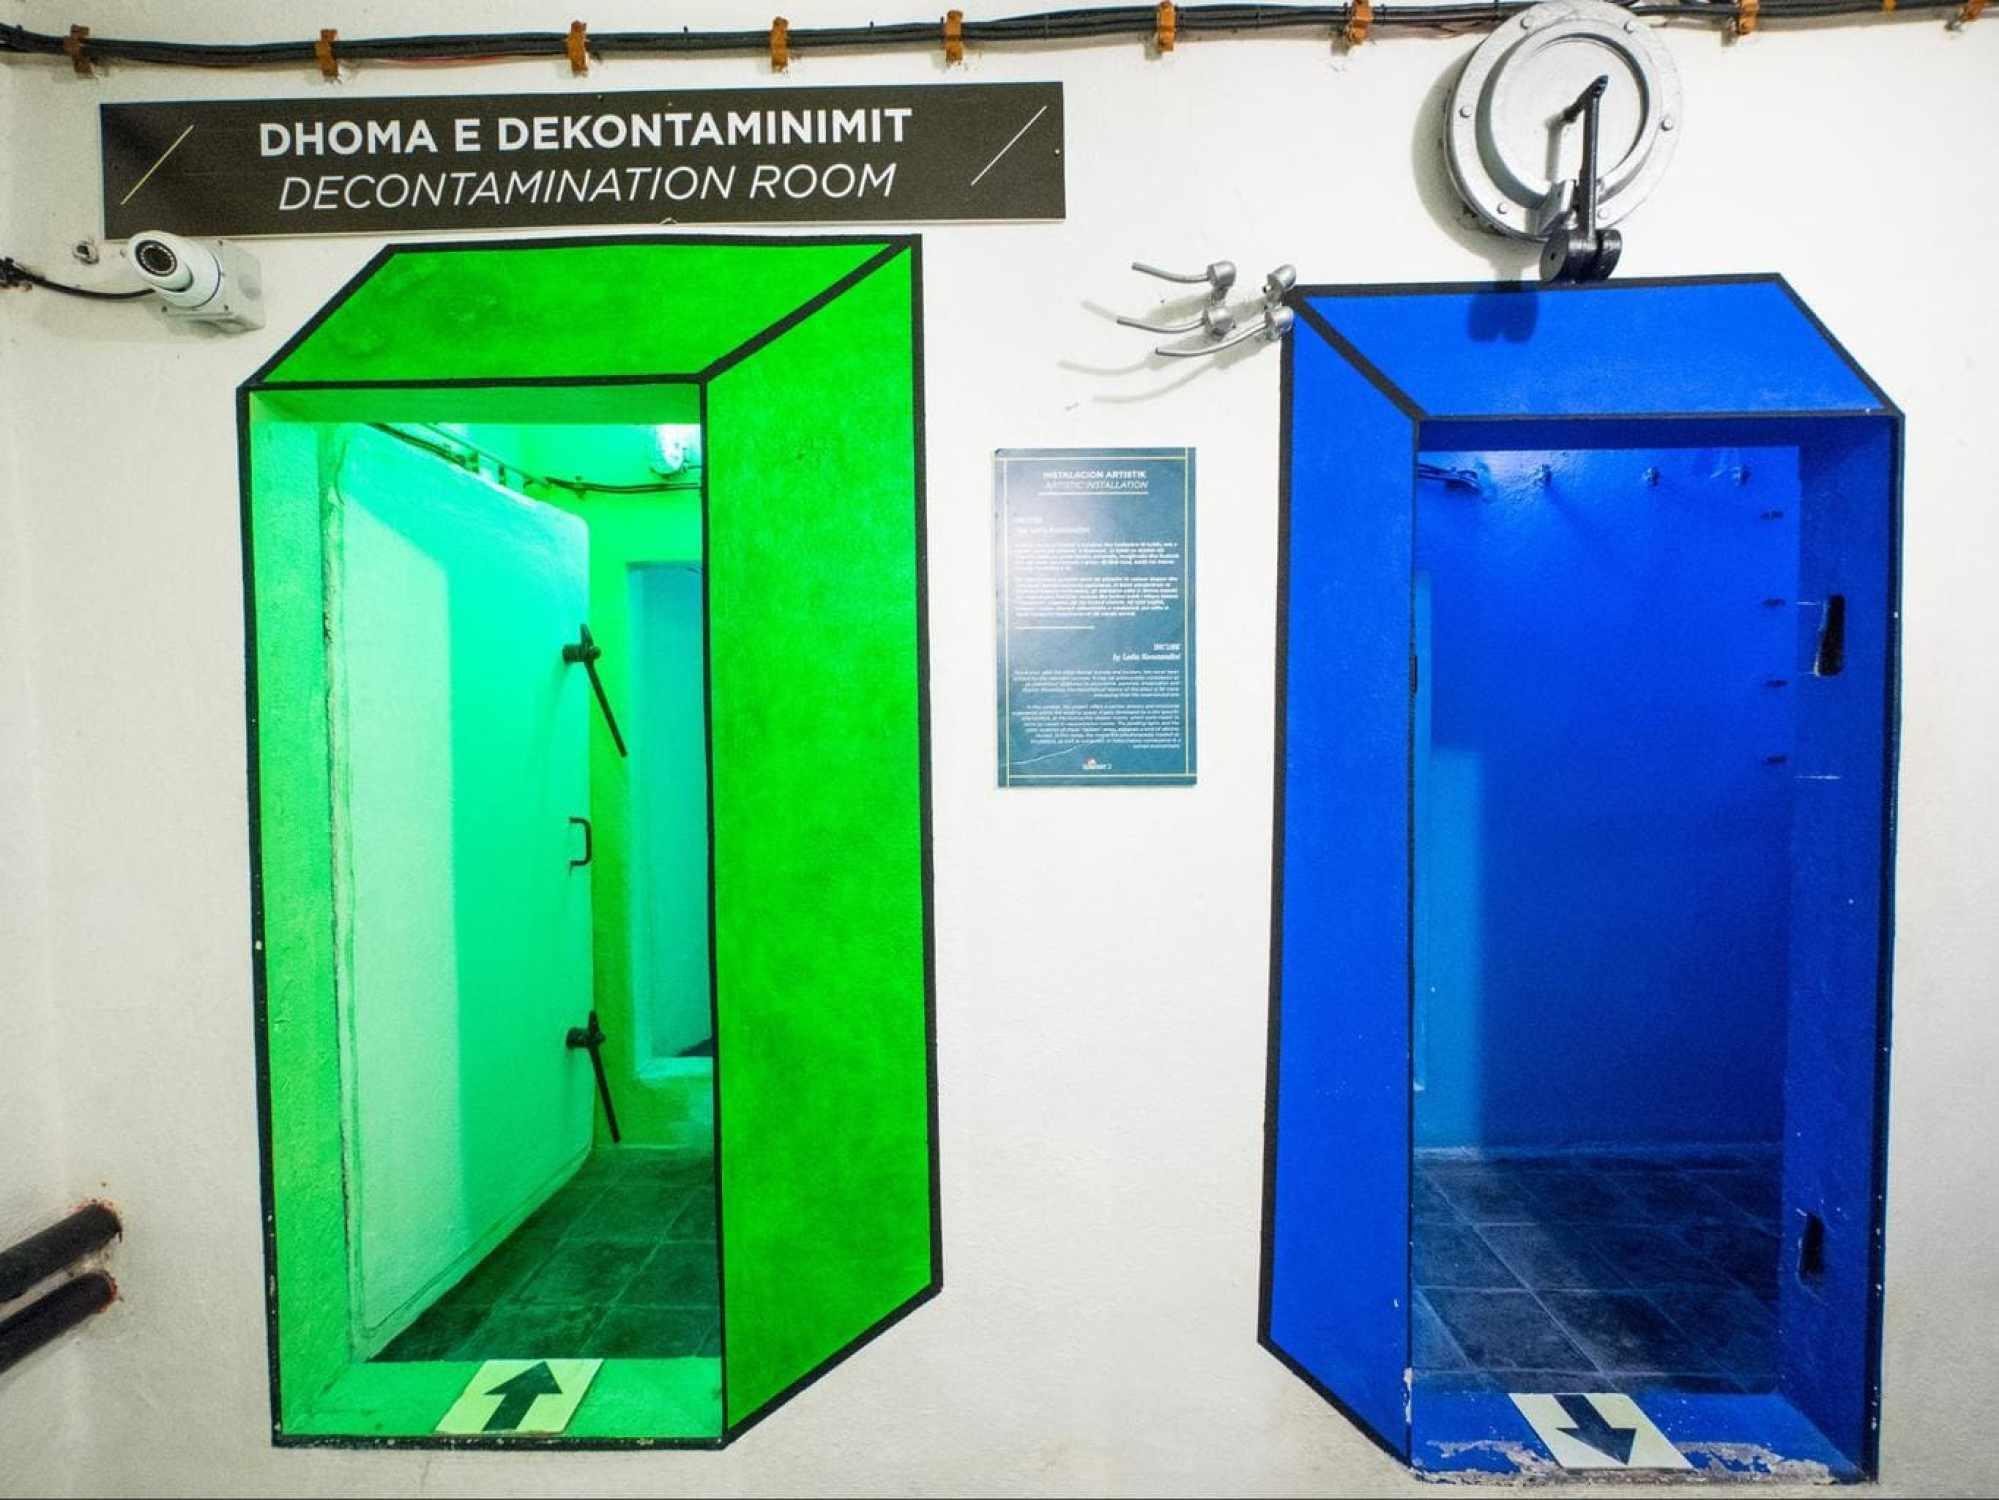 One of Bunk'Art 2 art installations